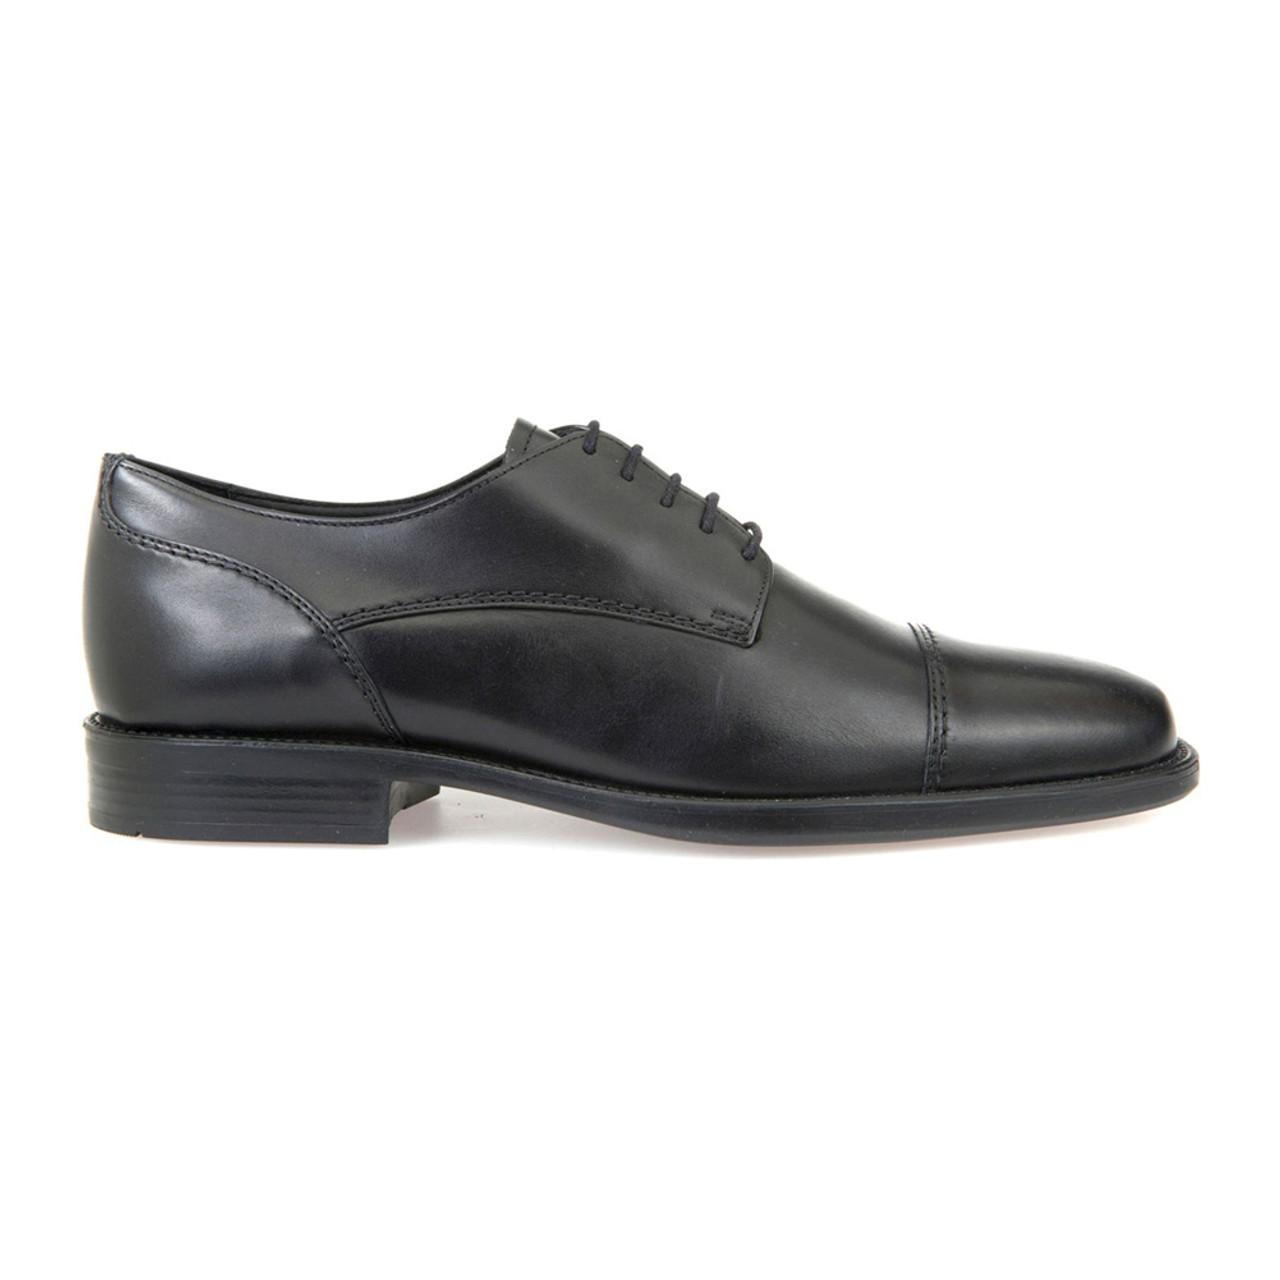 9cb8ae5d02a Geox Men s Federico Cap Toe Dress Oxford Black Leather - Shop now    Shoolu.com